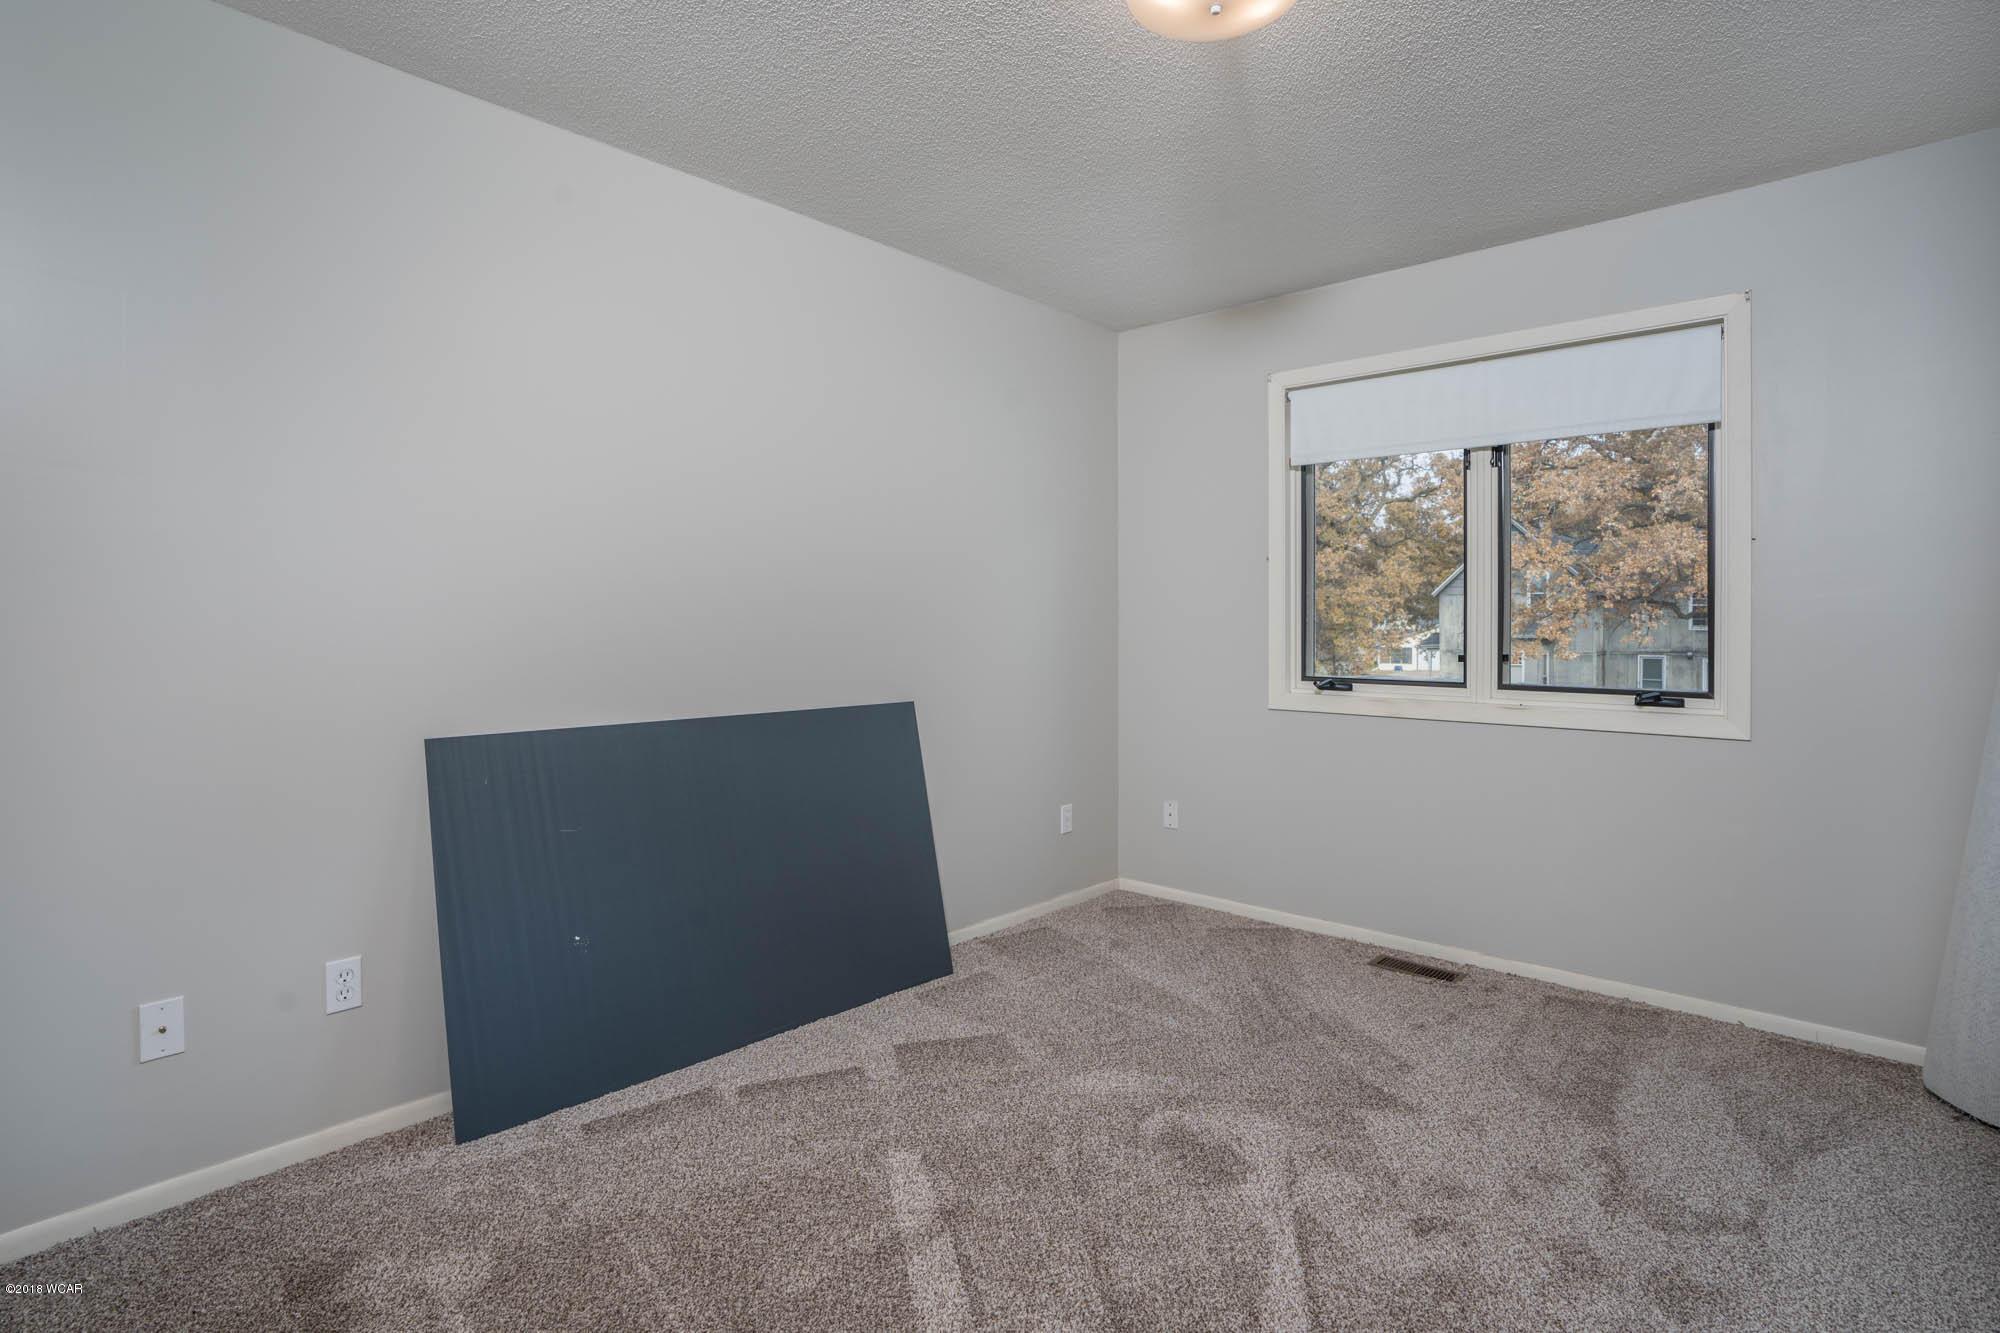 110 1st Avenue,New London,2 Bedrooms Bedrooms,2 BathroomsBathrooms,Single Family,1st Avenue,6032691